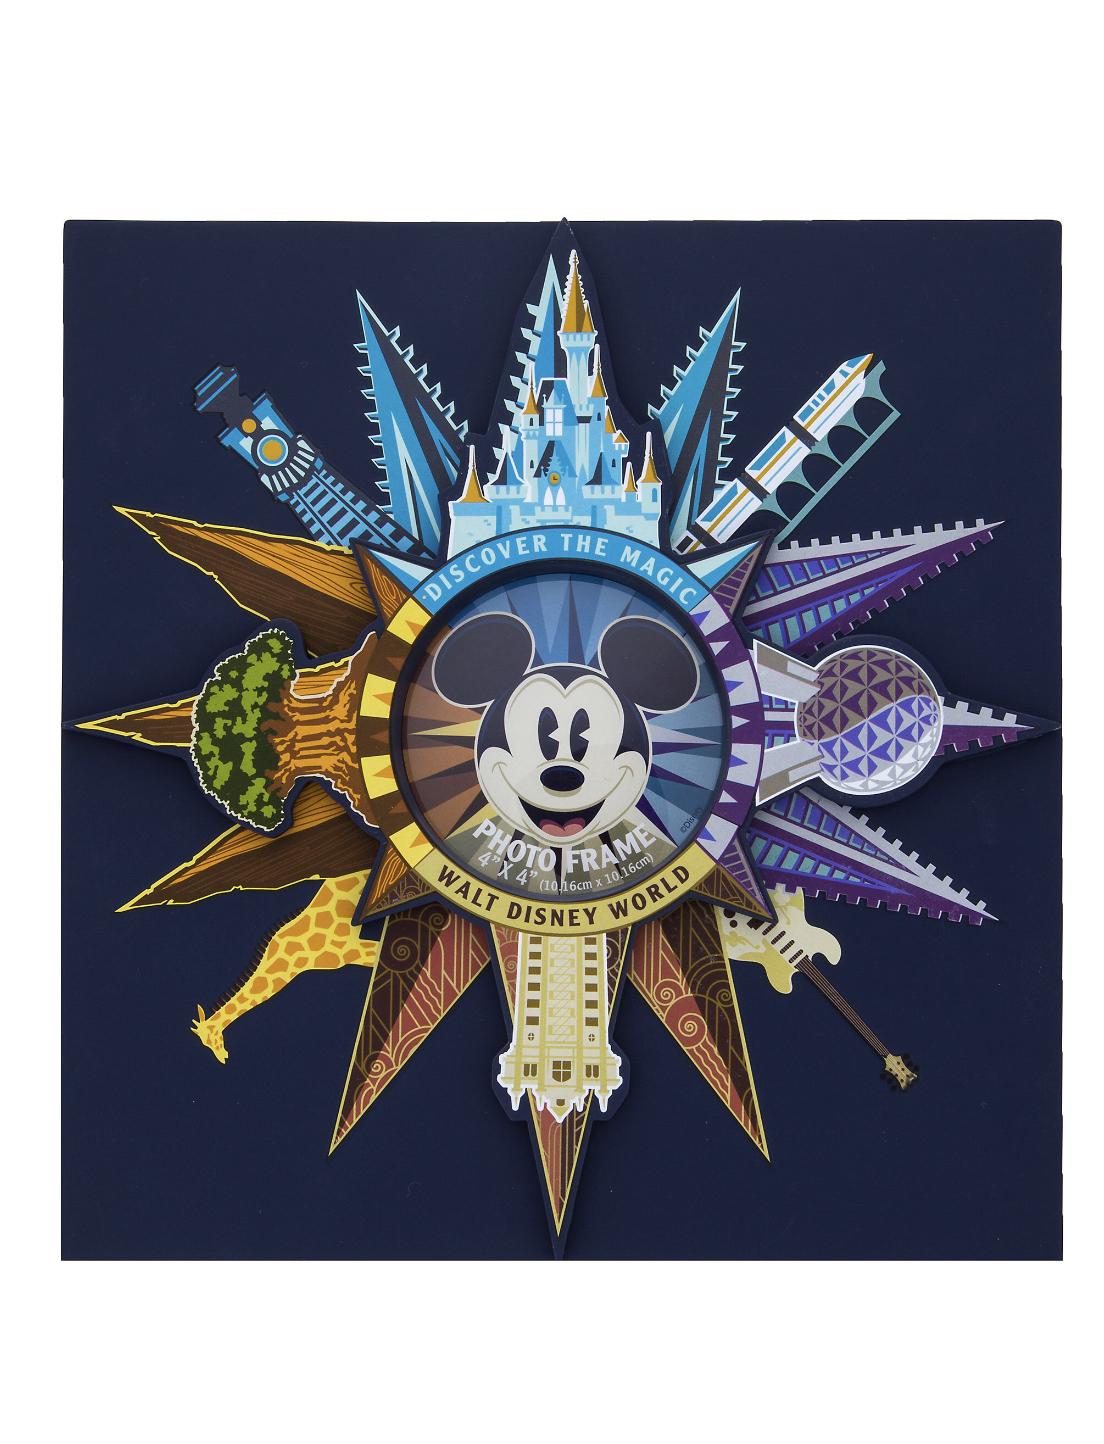 Walt Disney World Mickey Mouse Four Parks and 12 similar items